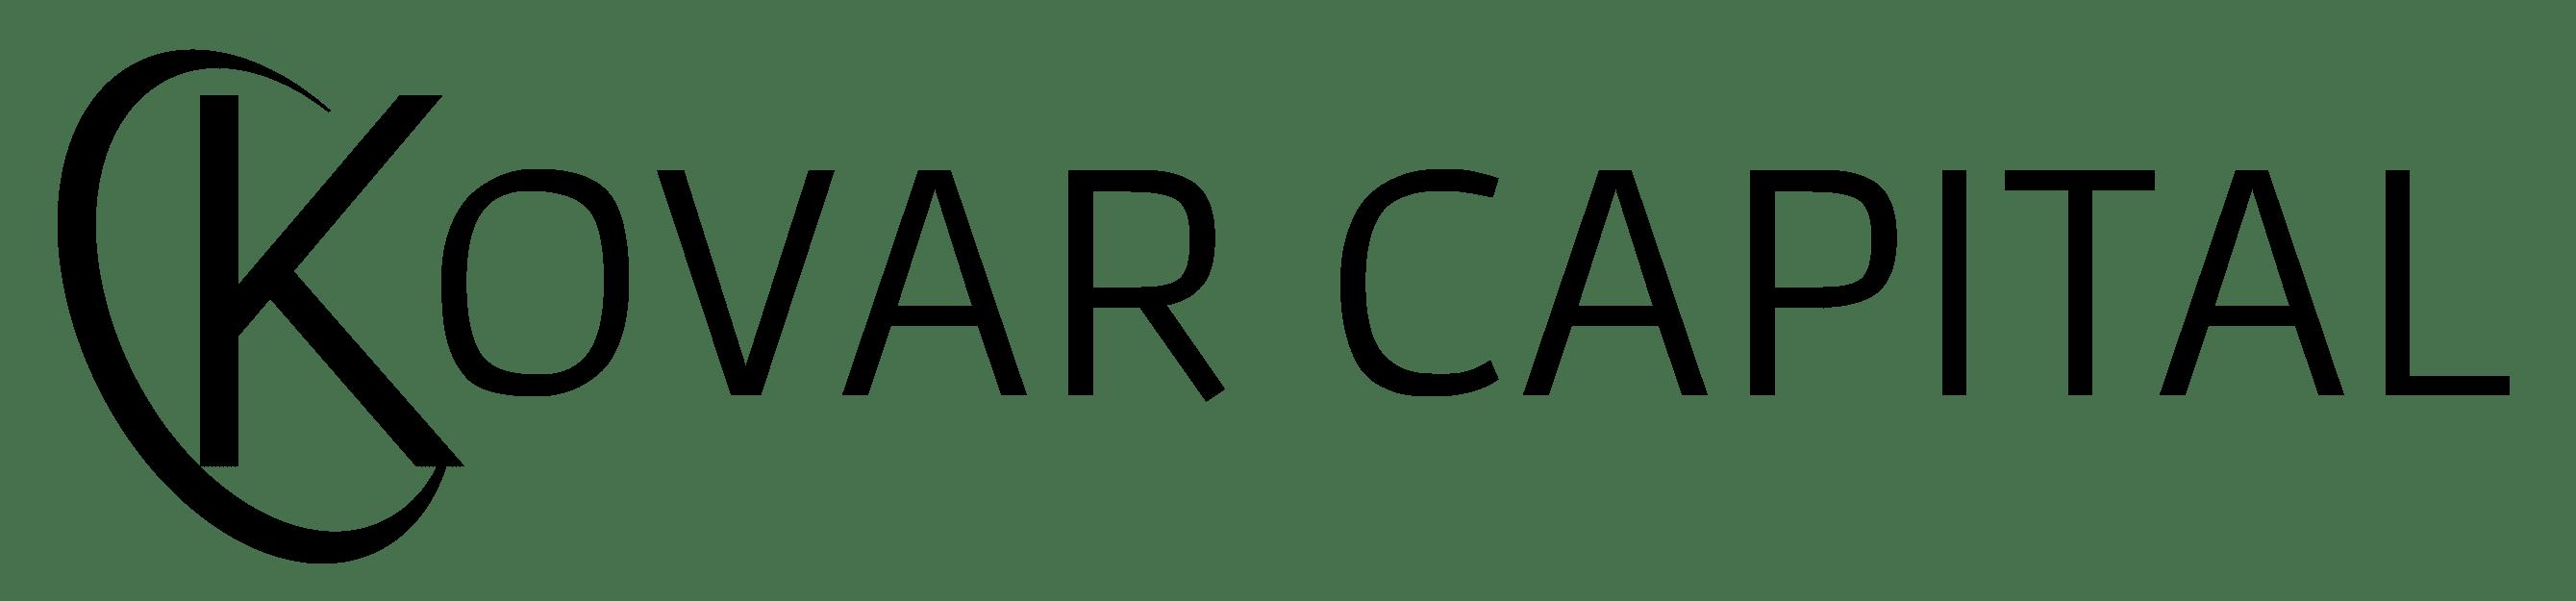 Kovarcapital